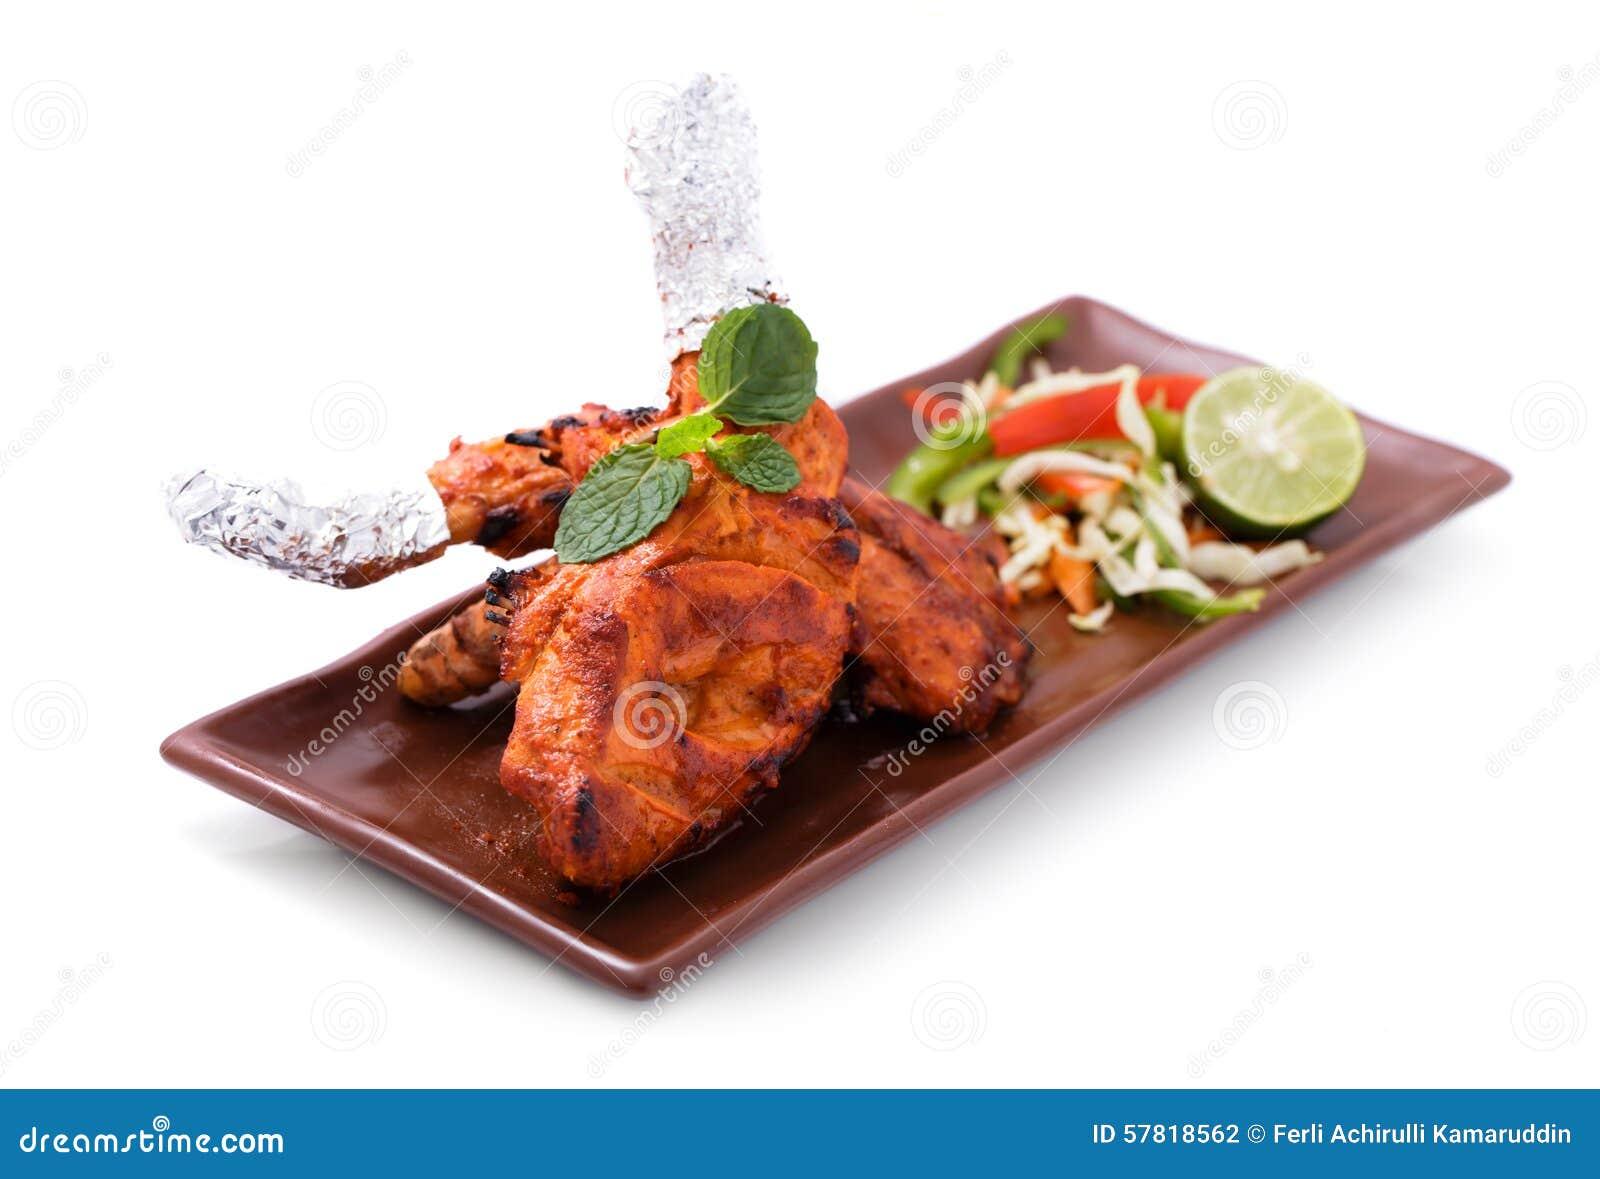 Delicious, indian tandoori chicken served with salad